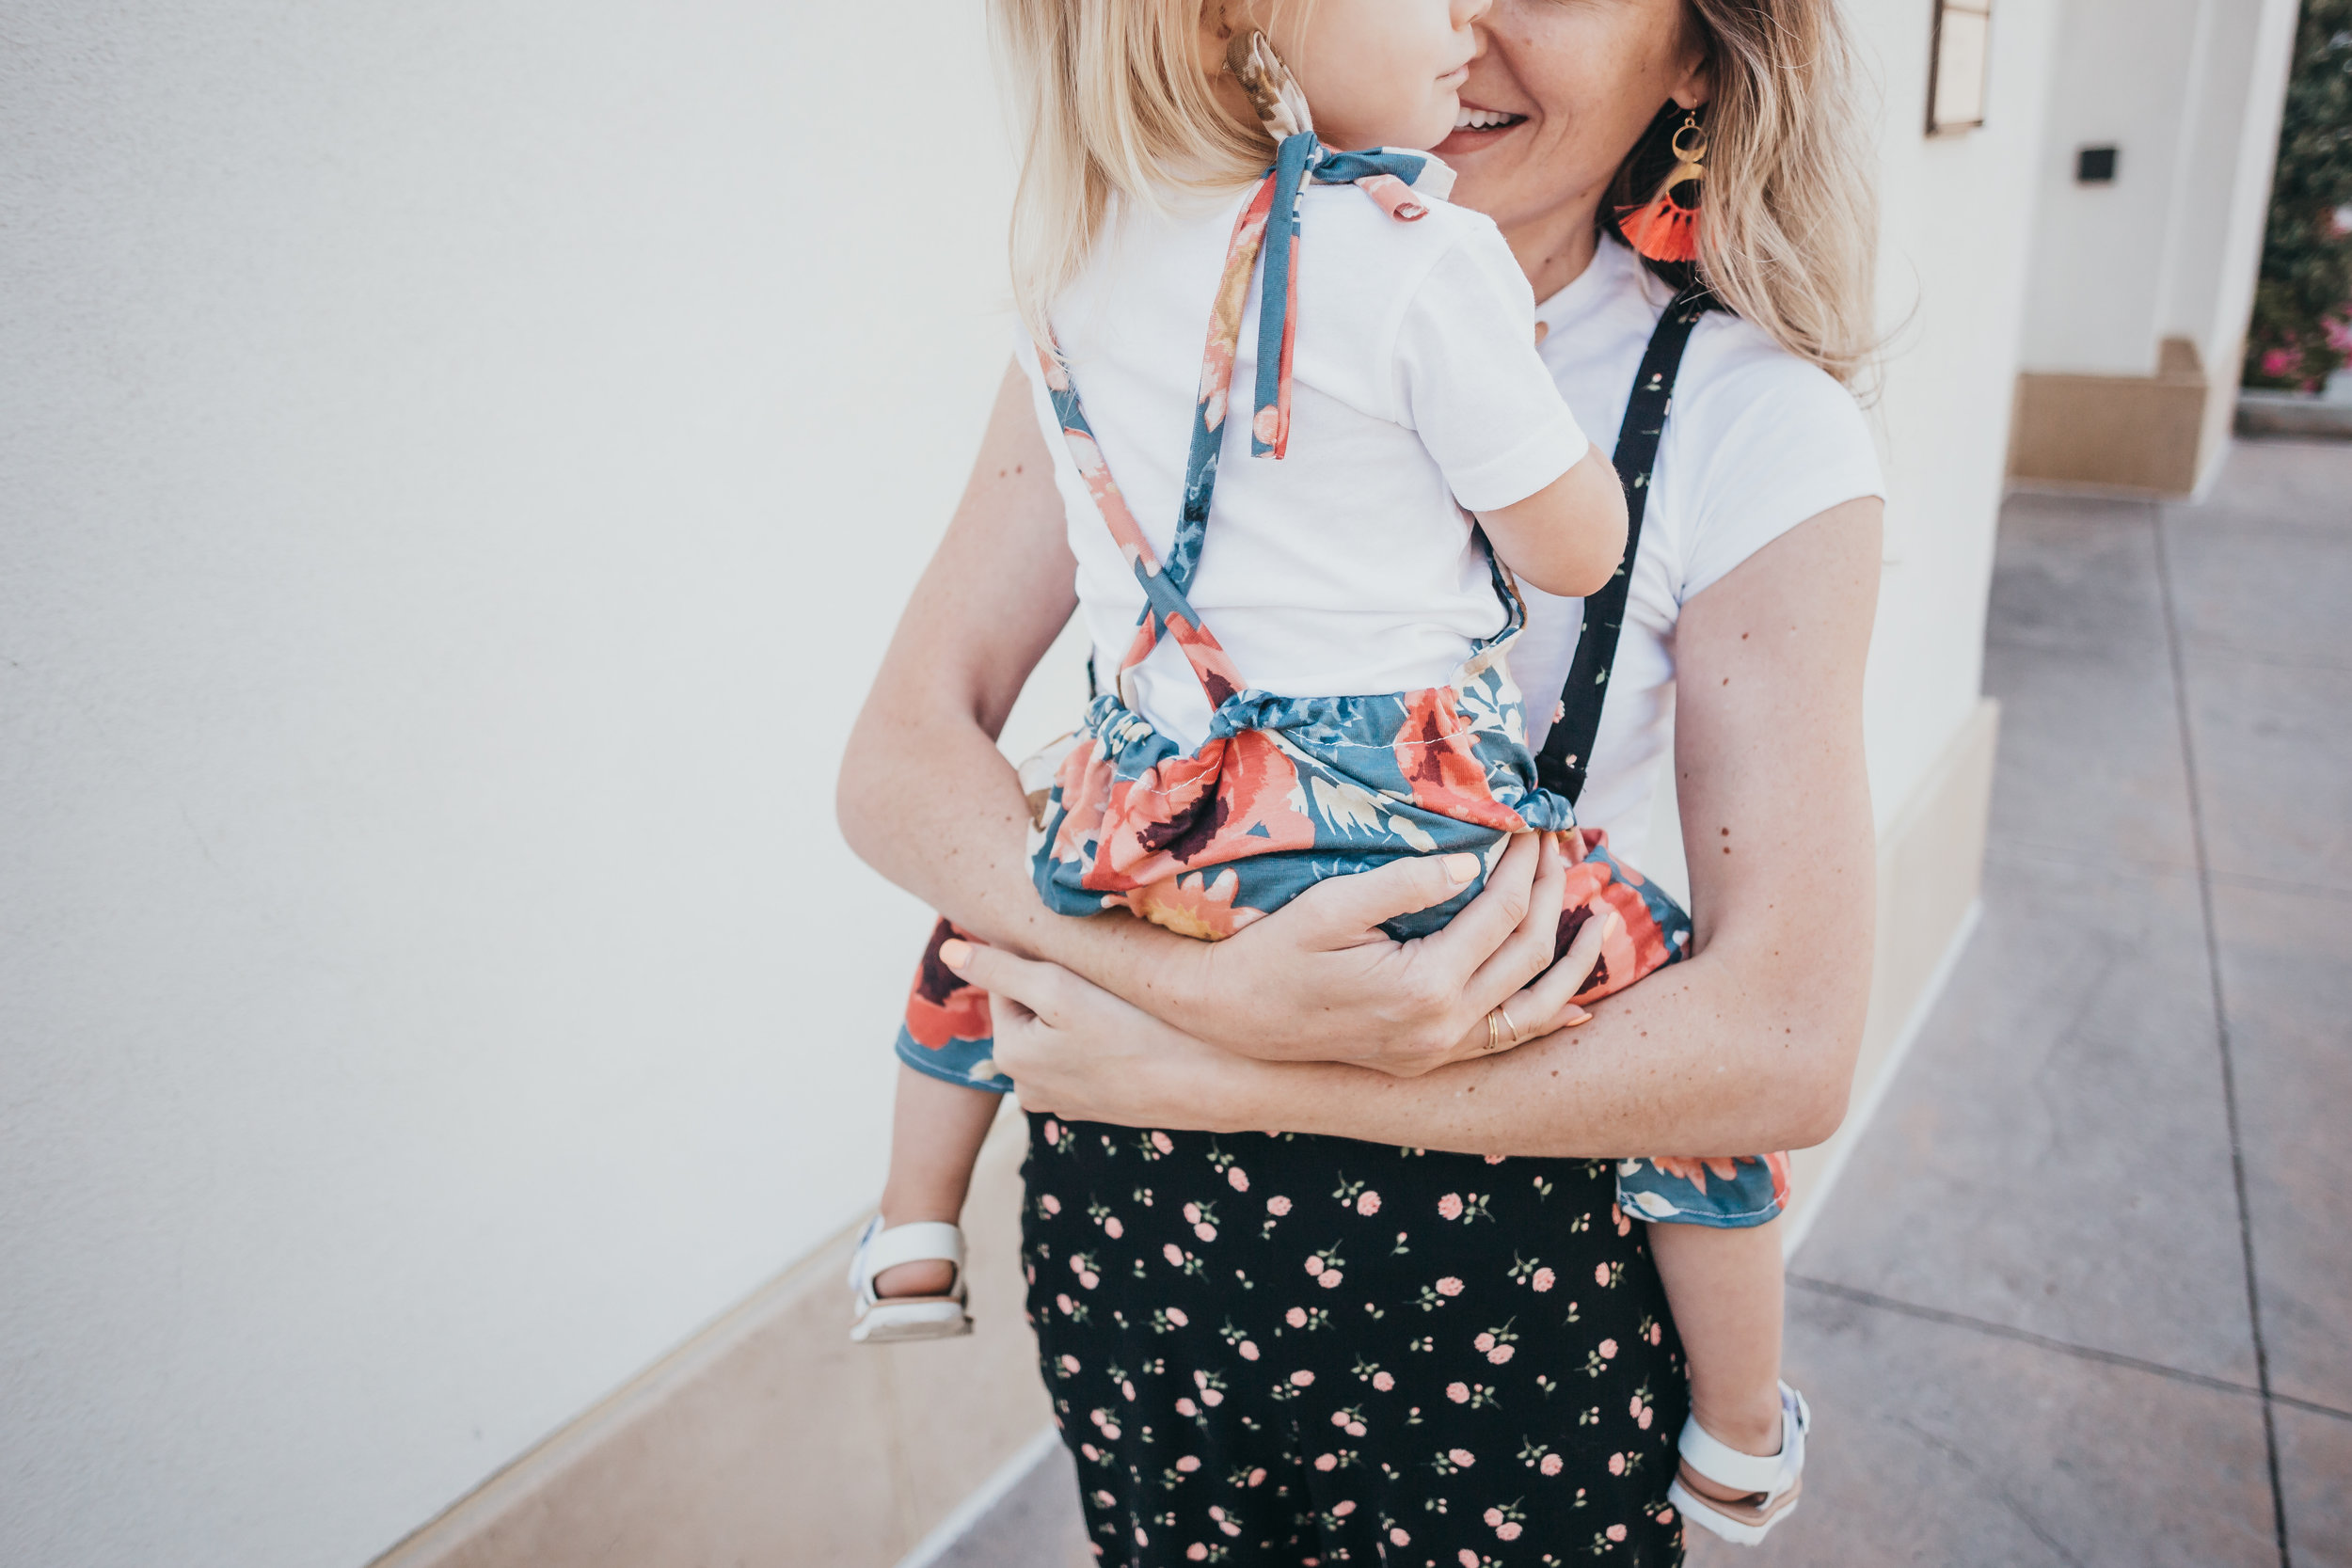 Women's Overall Style Jumpsuit - Kids Floral Jumpsuit - Cute Kids Clothes